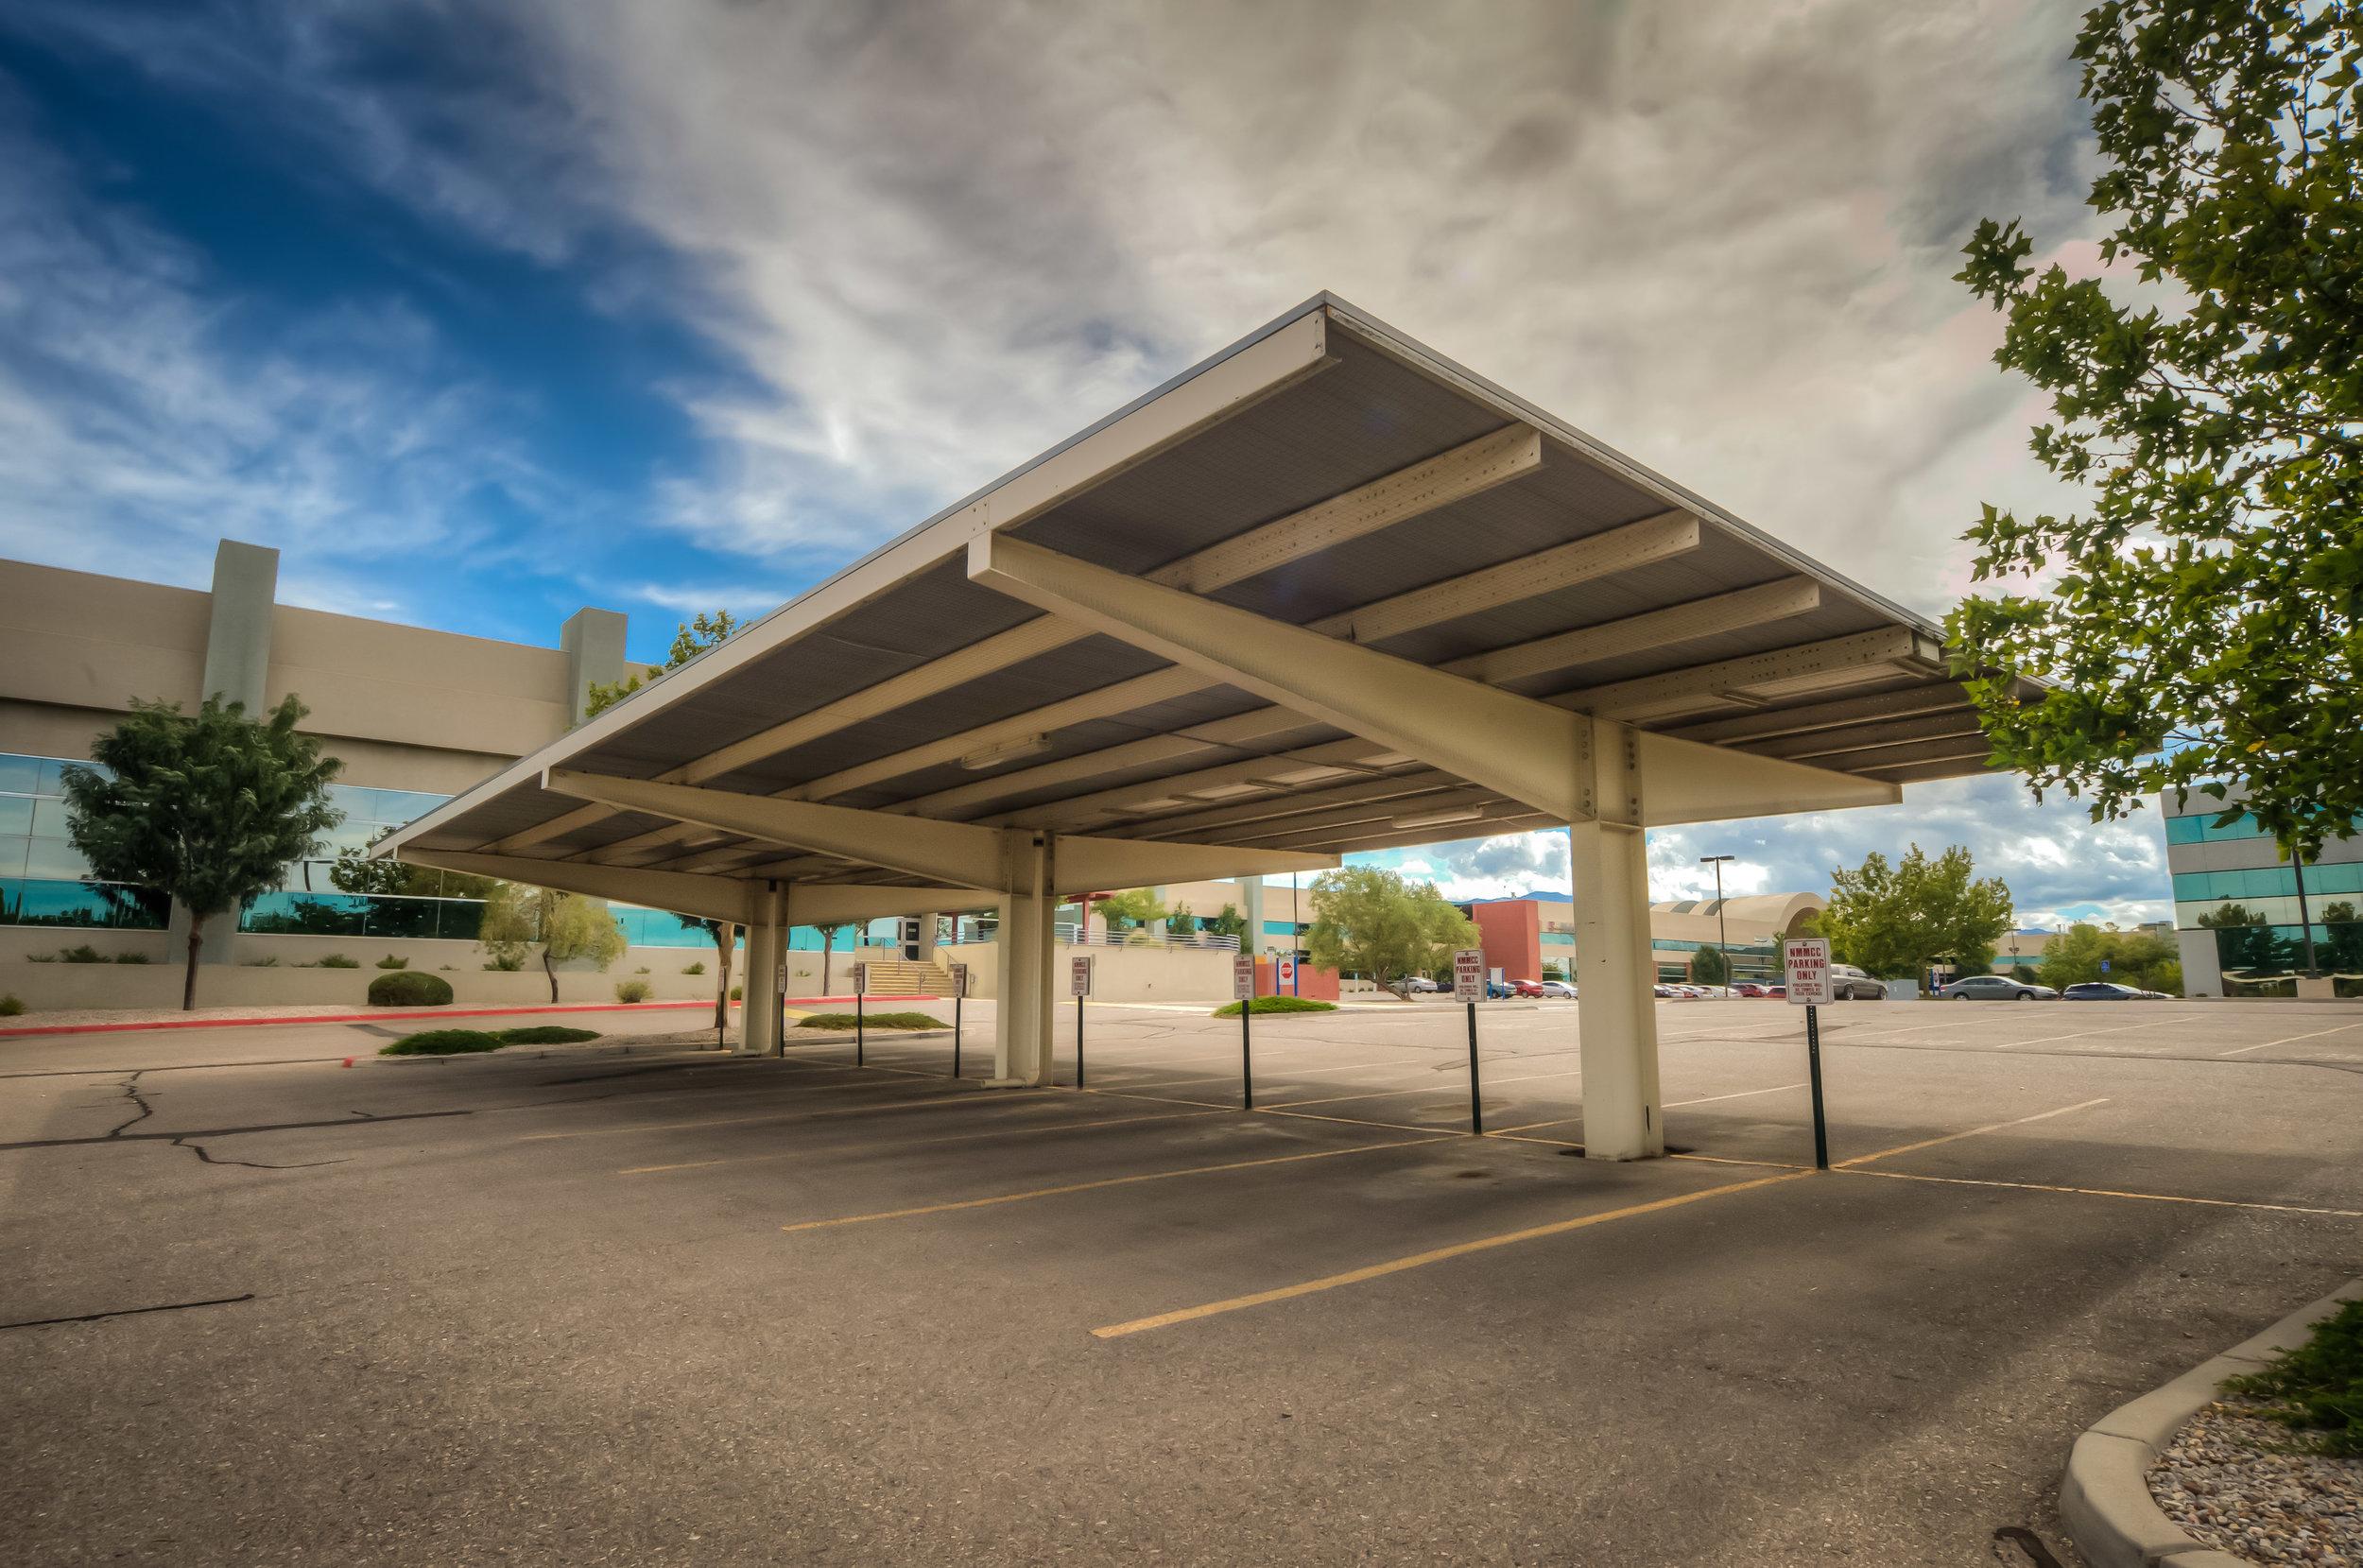 3900 Singer - Canopy Parking